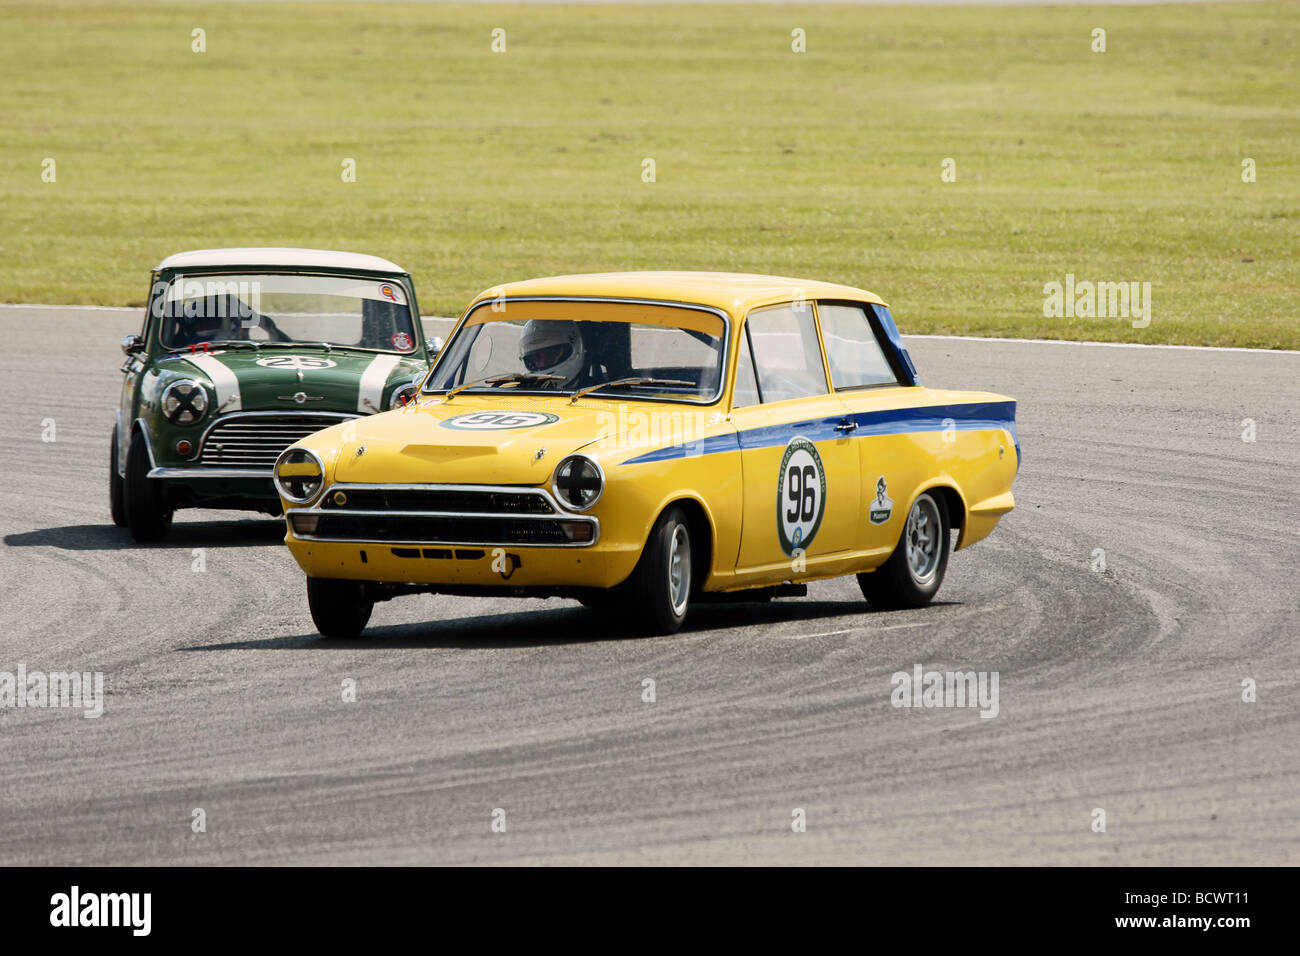 Drifting Lotus Cortina Stock Photo